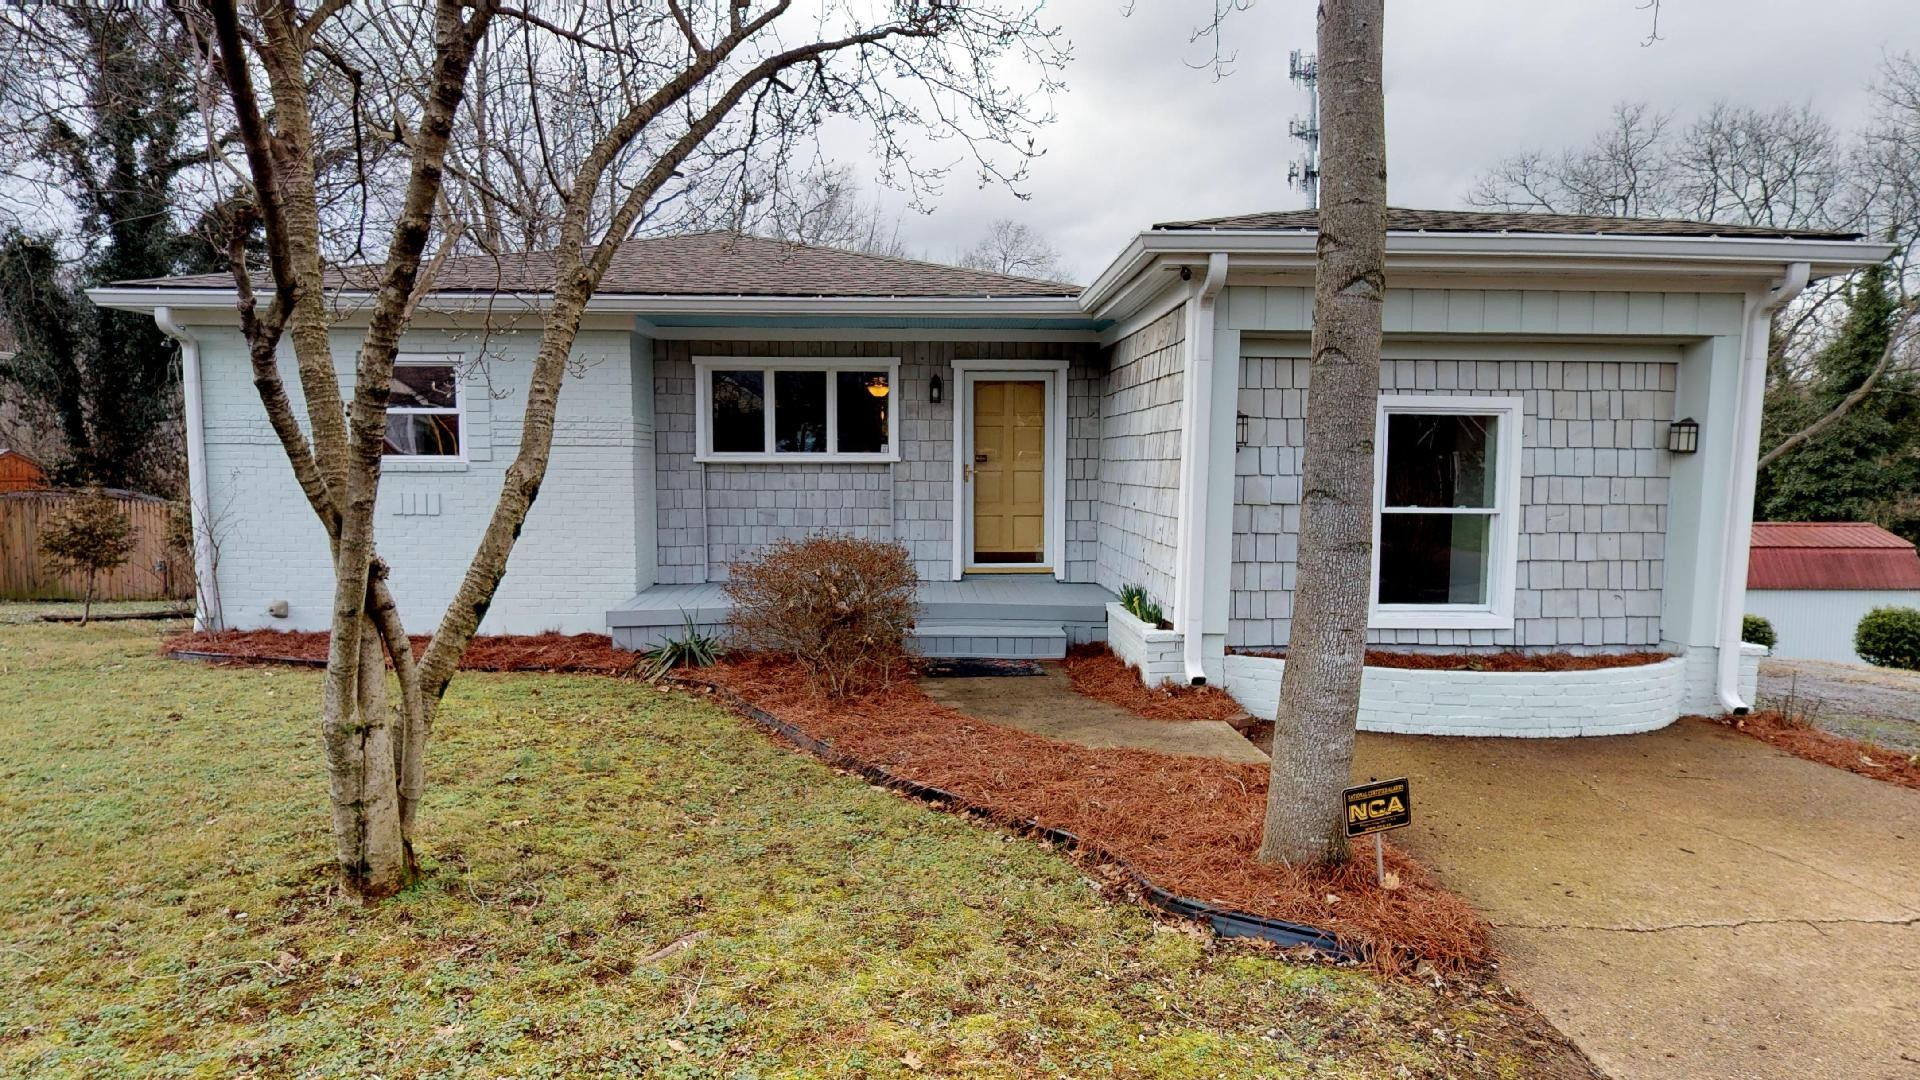 4911 Ruskin Ave, Nashville, TN 37216 - Nashville, TN real estate listing